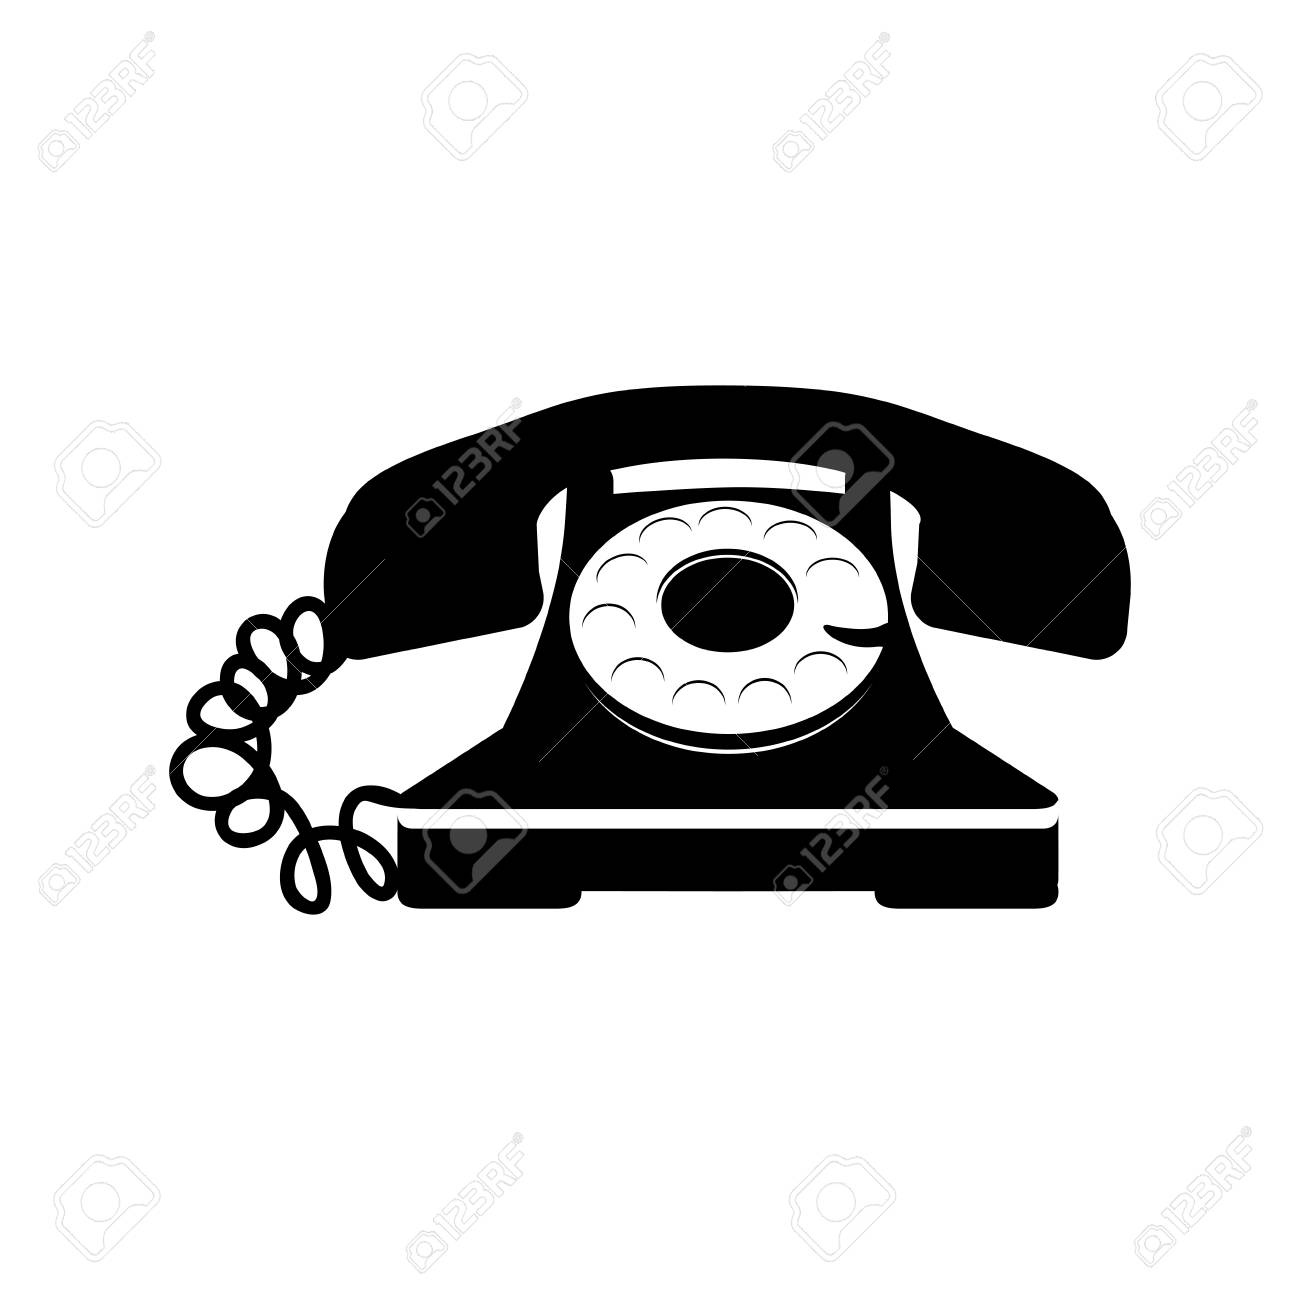 sticker black telephone icon vector illustraction design image